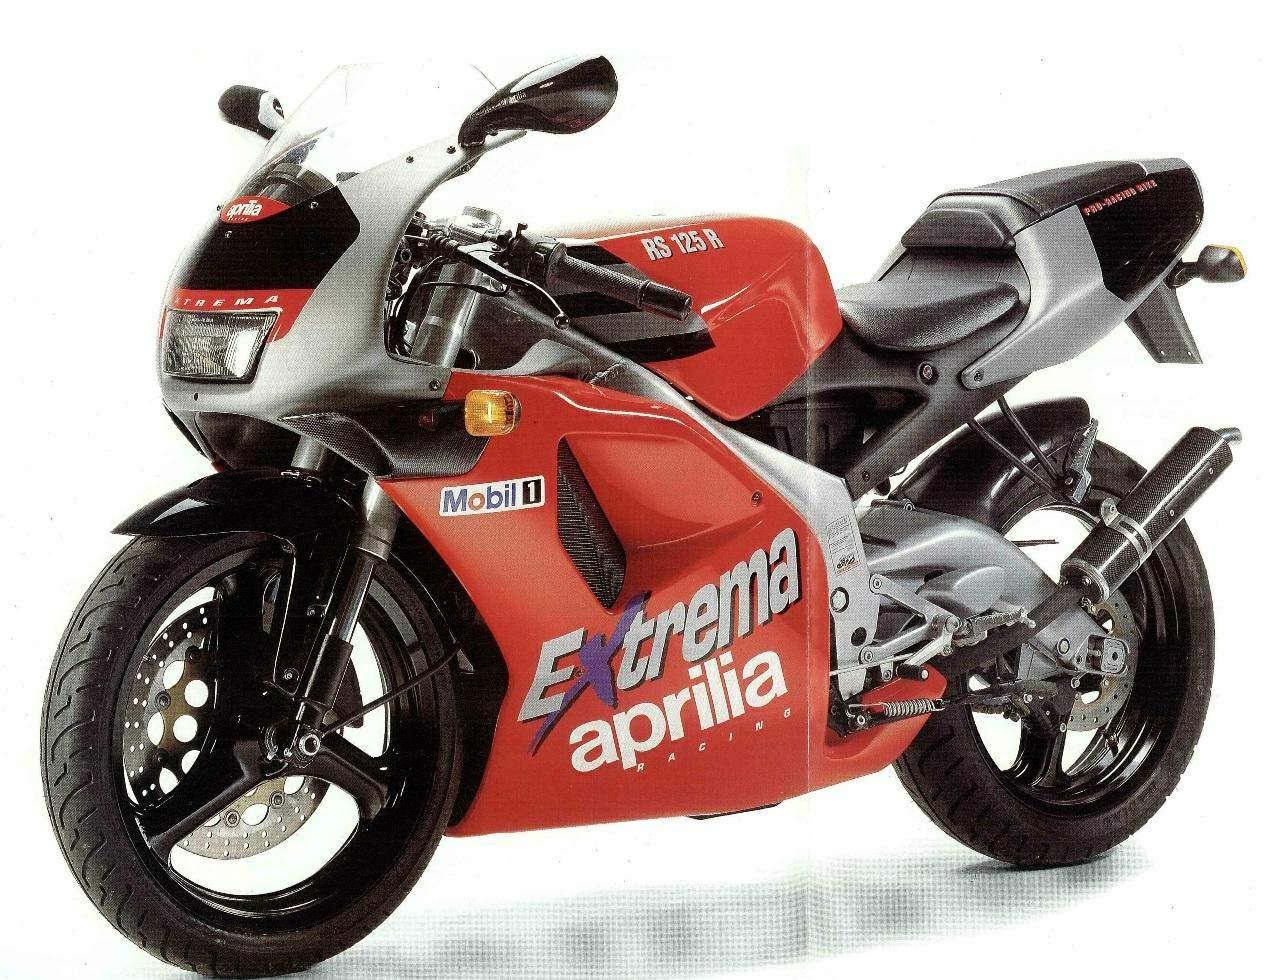 Moto del día: Aprilia RS 125 Extrema